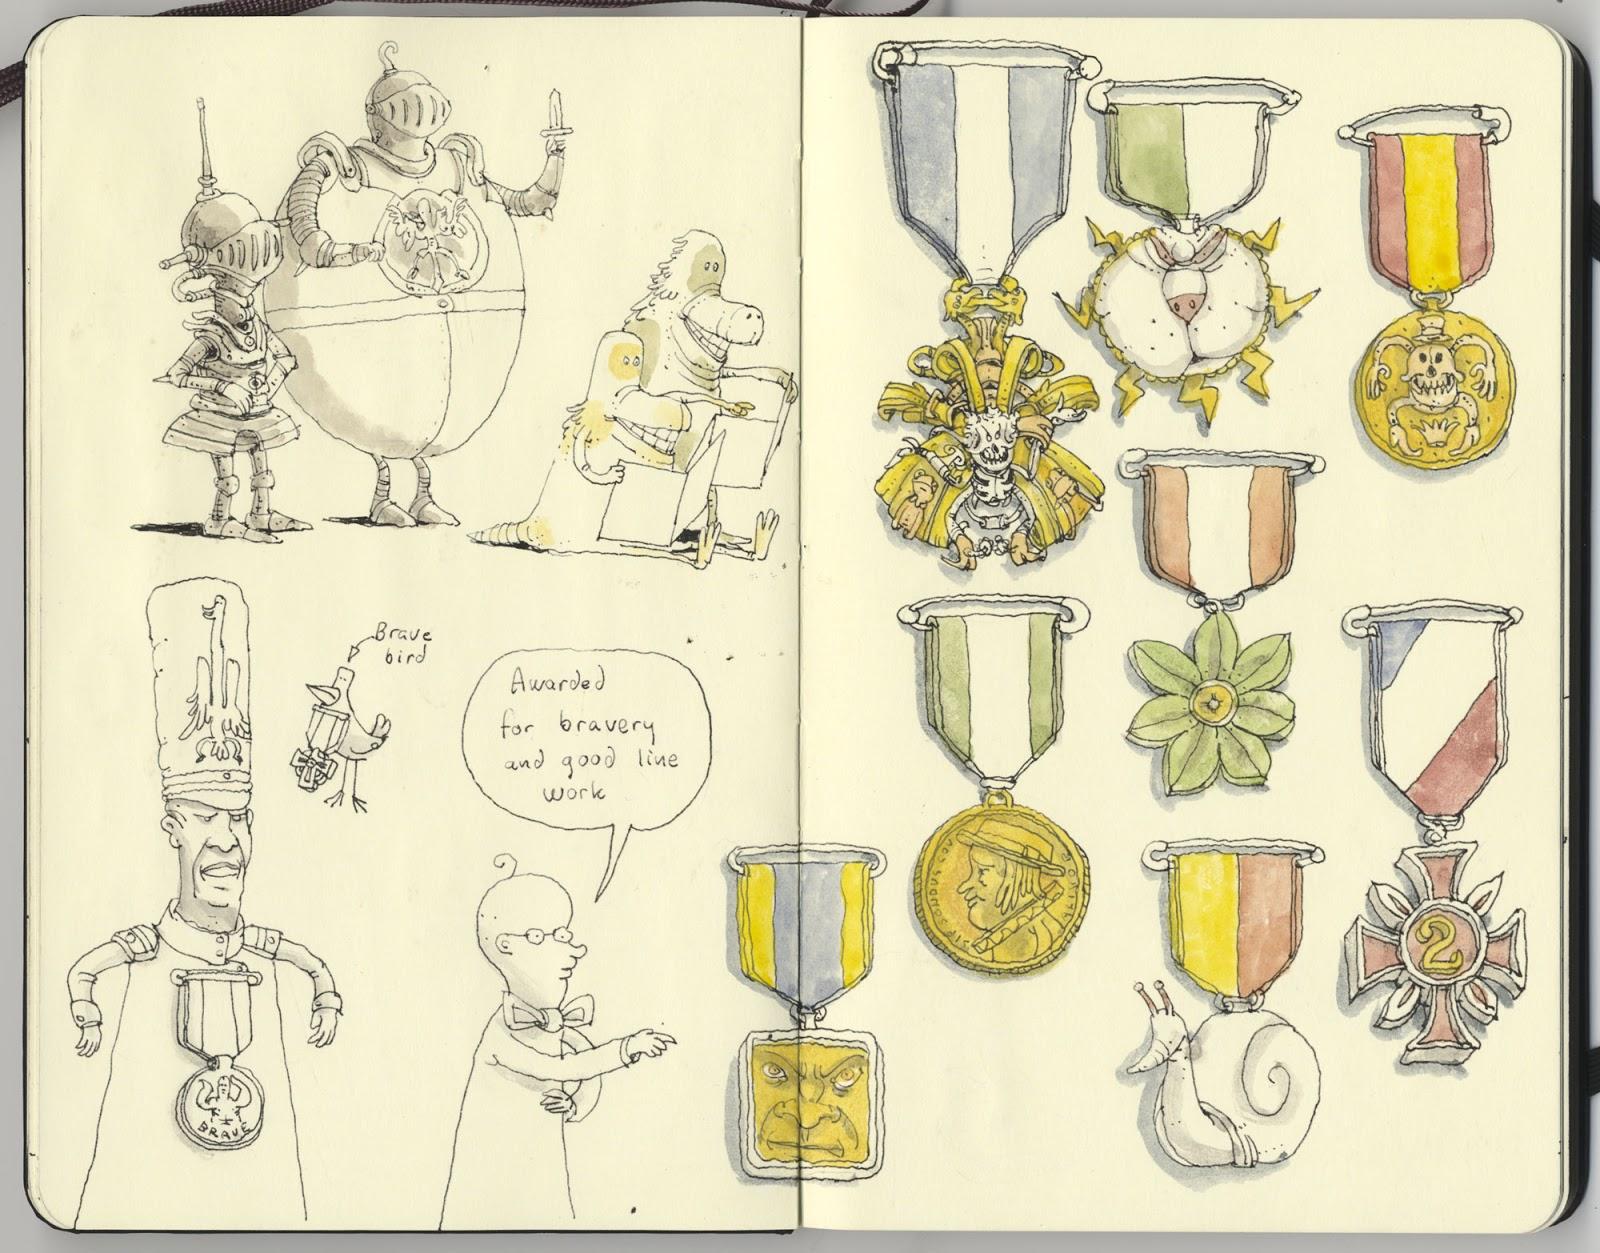 Mattias Adolfsson sketch illustration 5